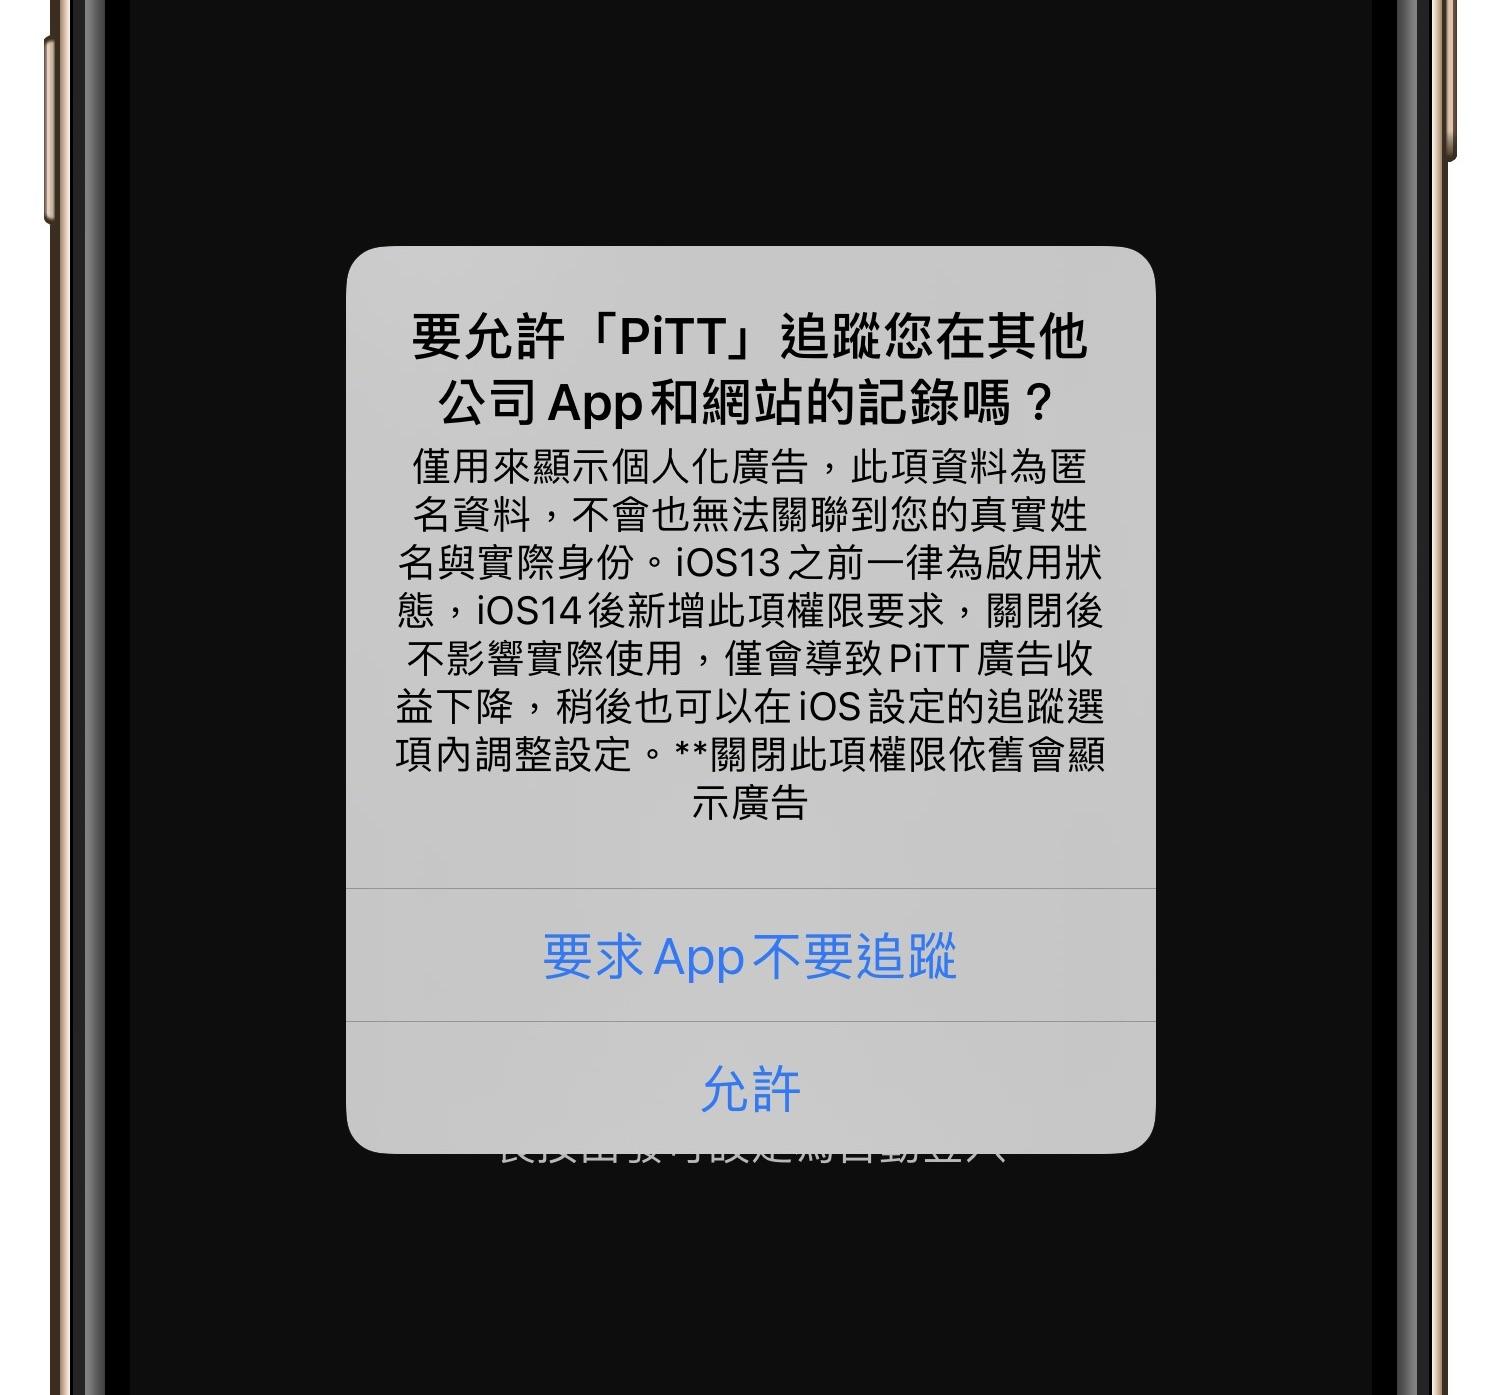 iOS 14.5 隱私